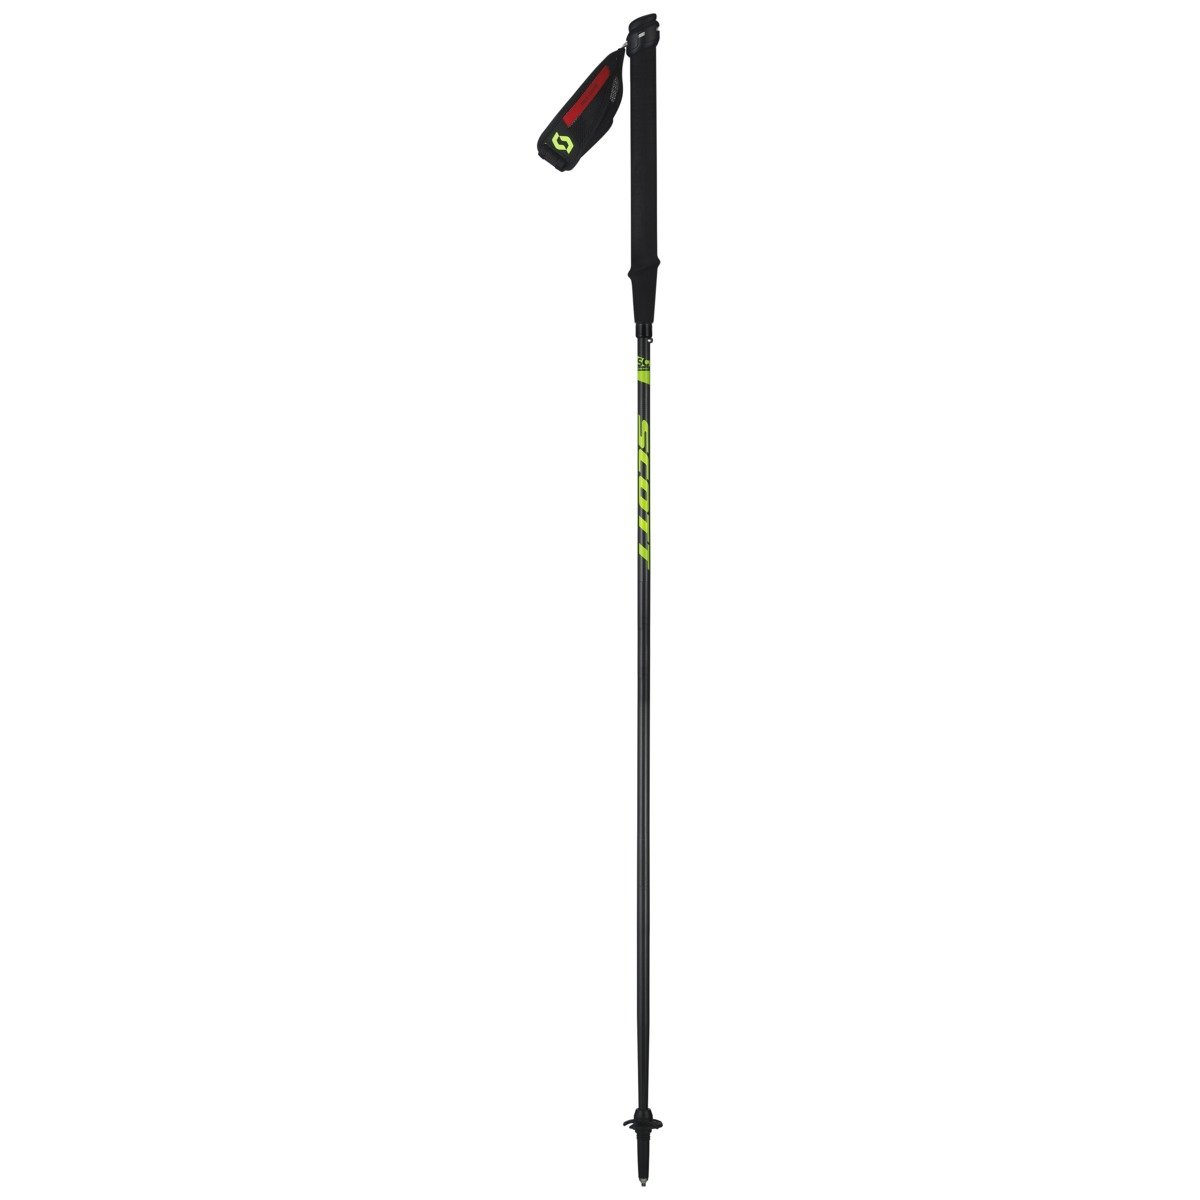 SCOTT(スコット) Running Pole RC 3-part bk 130 2398690001082 ブラック 130cm   B06XCL4N9S